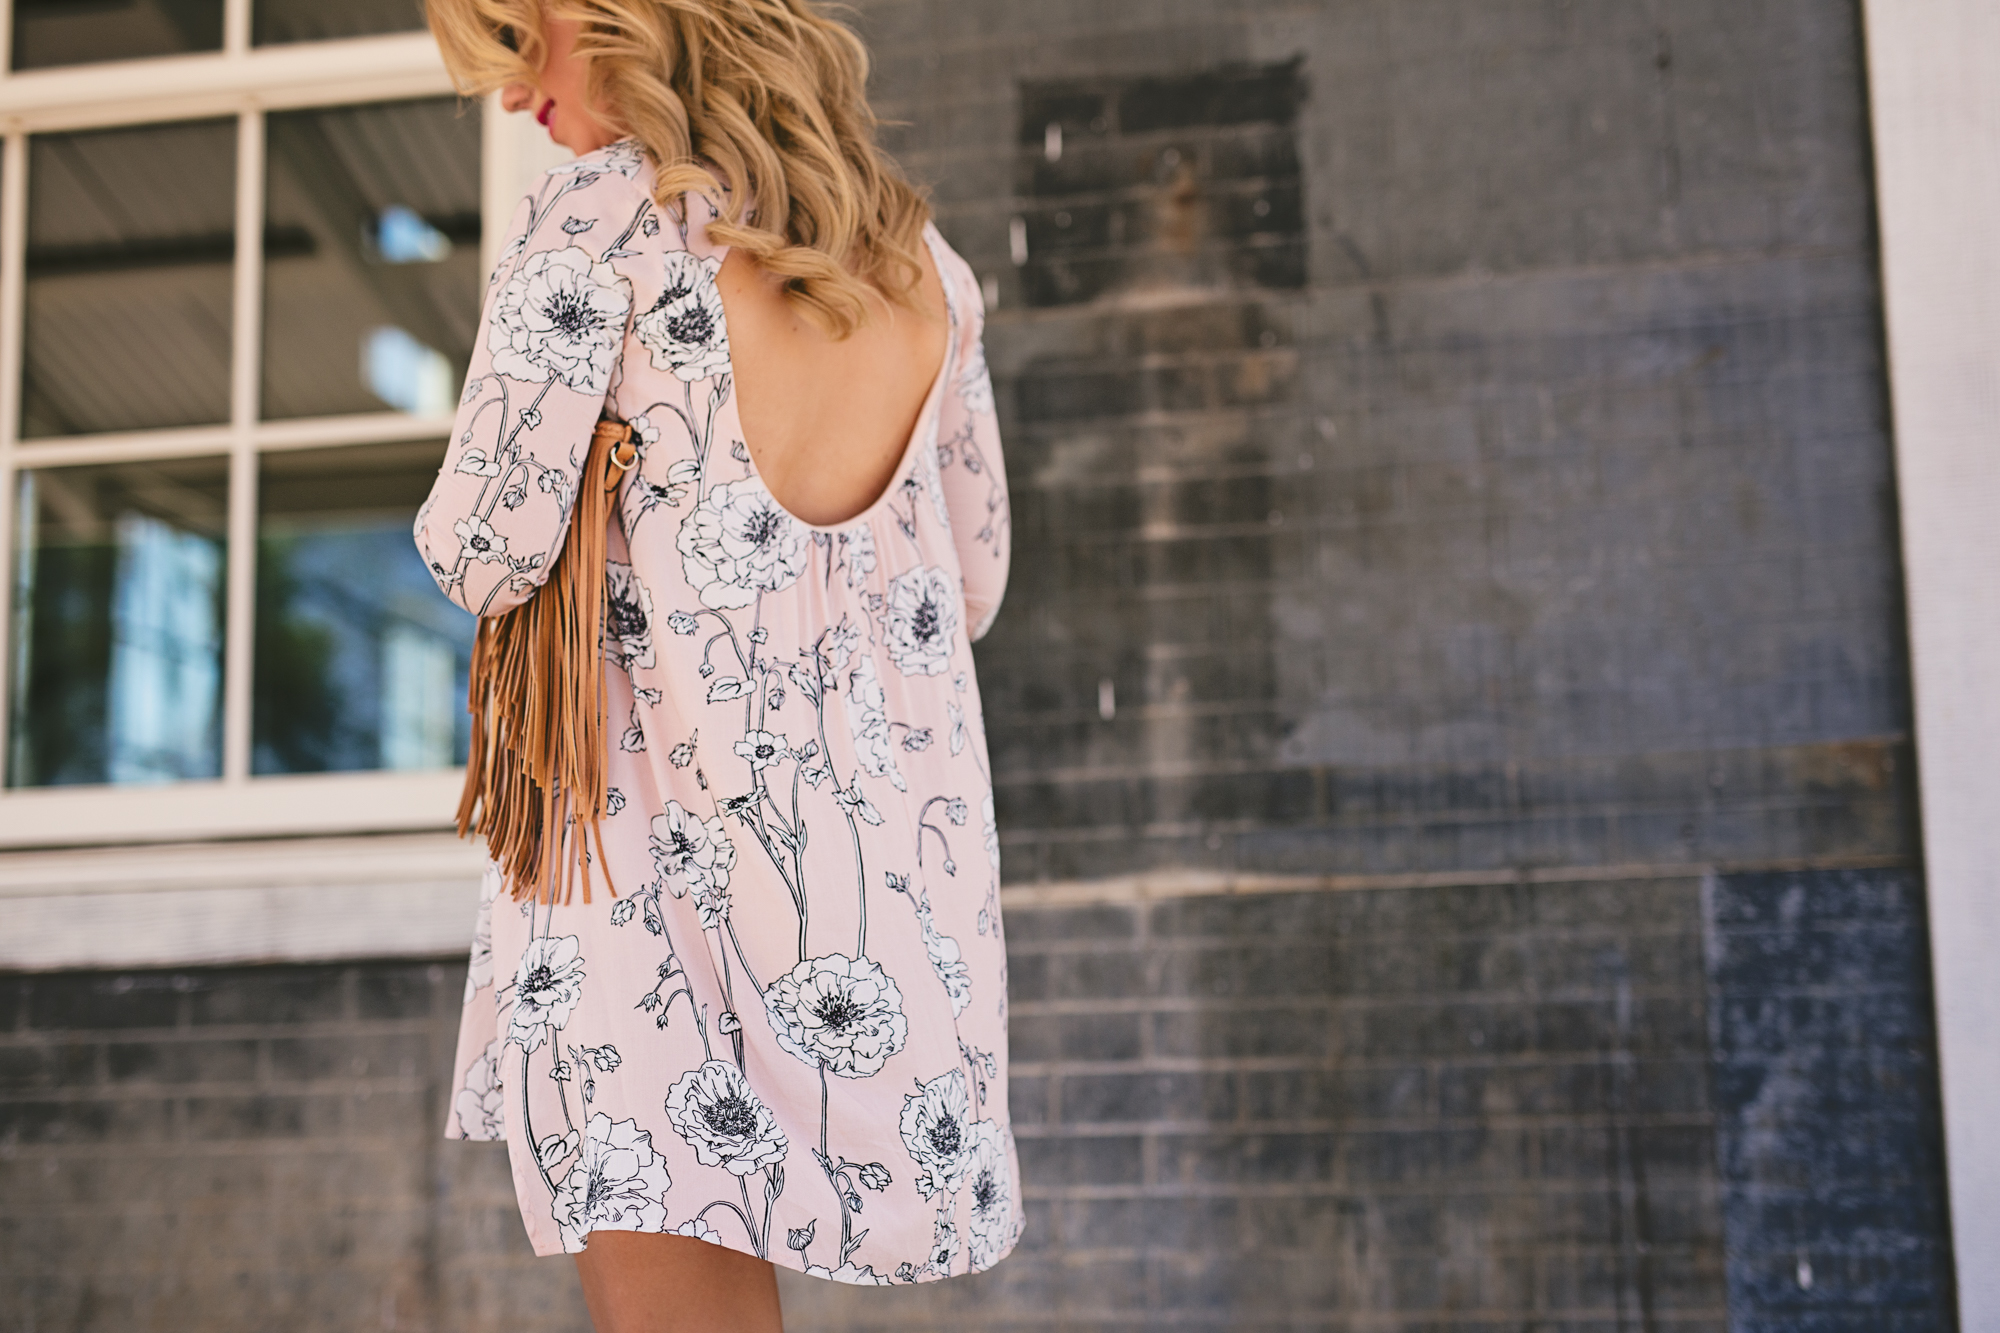 pinkdress-6.jpg